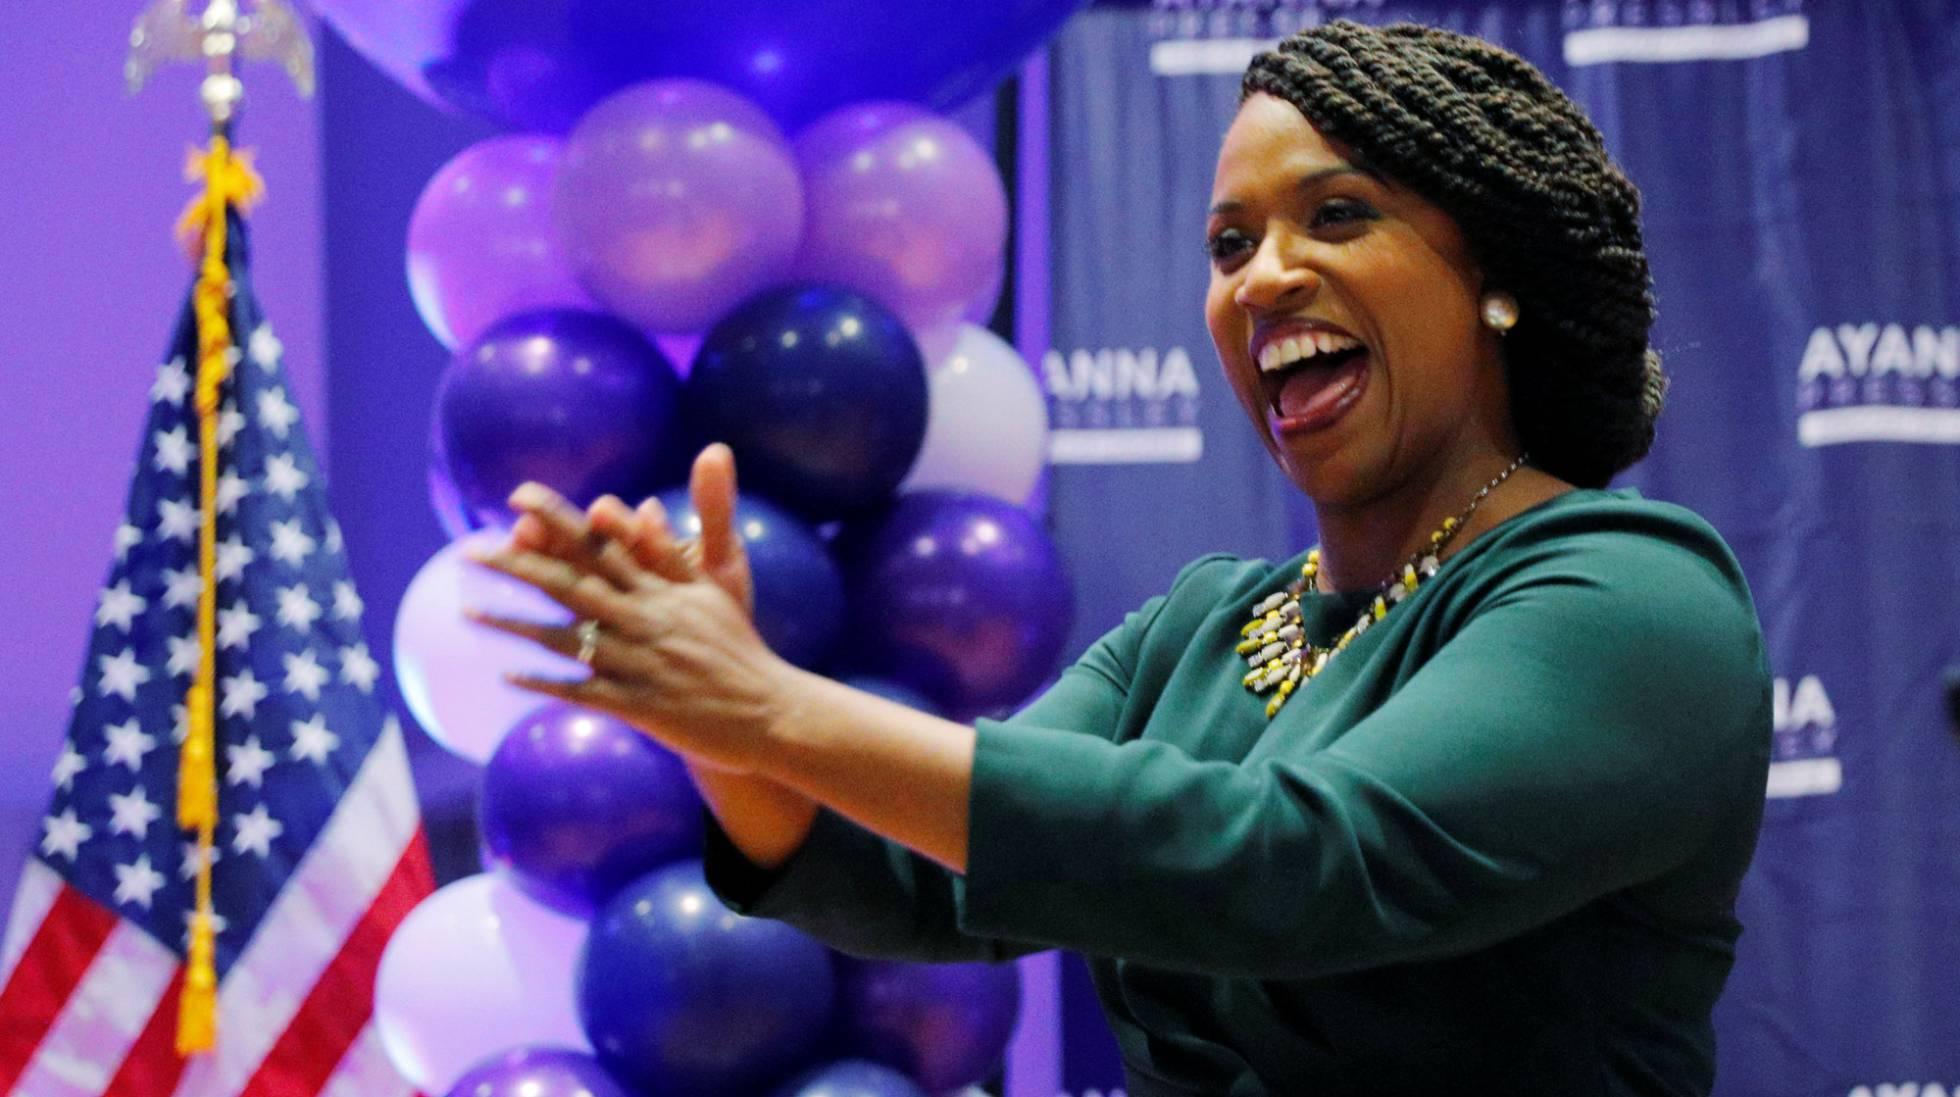 Una demócrata afroamericana se impone a un veterano congresista en Massachusetts